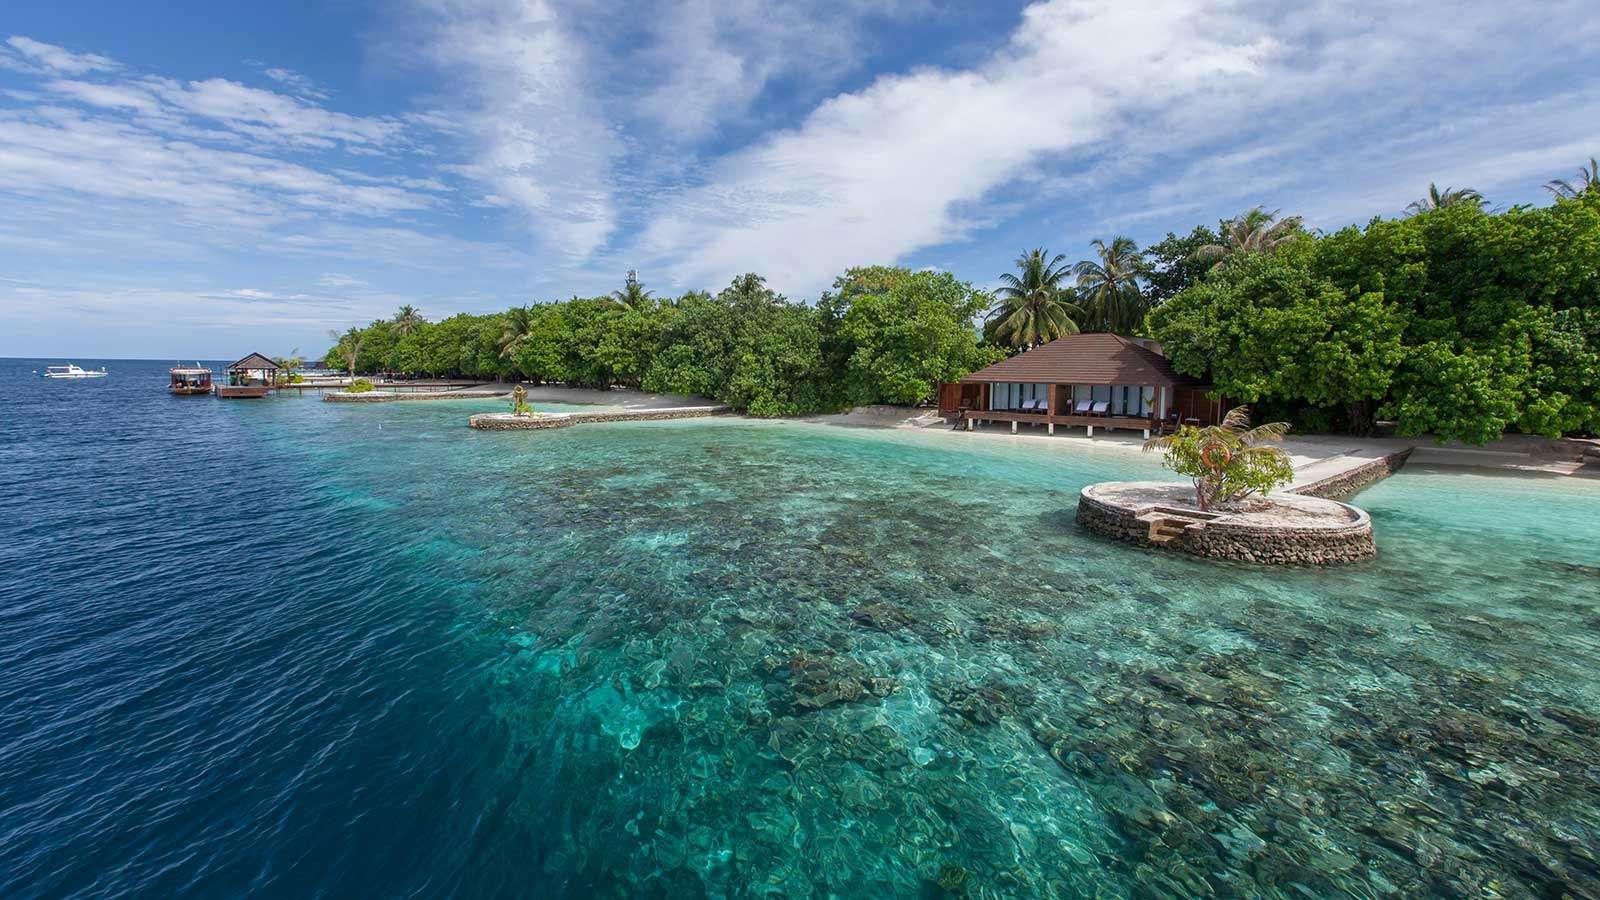 Luxury villa rentals asia - Maldives - Huvahandhoo - Lily beachresortandspa - Lagoon Villa - Image 1/7